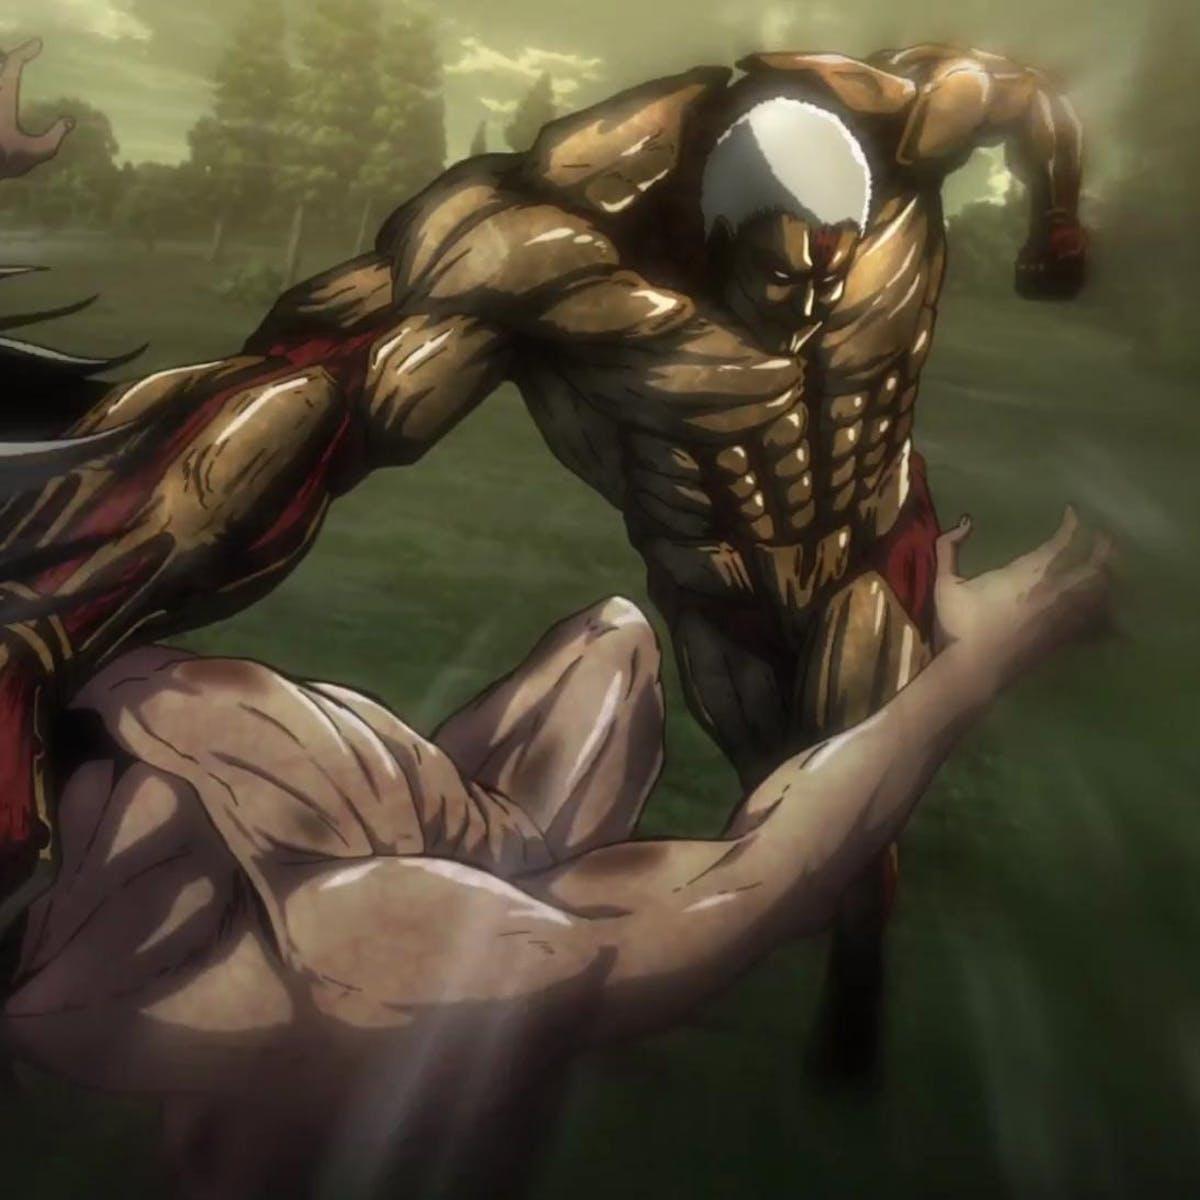 'Attack on Titan' Season 3 Theories: Explaining the Titan's Hellish Origins